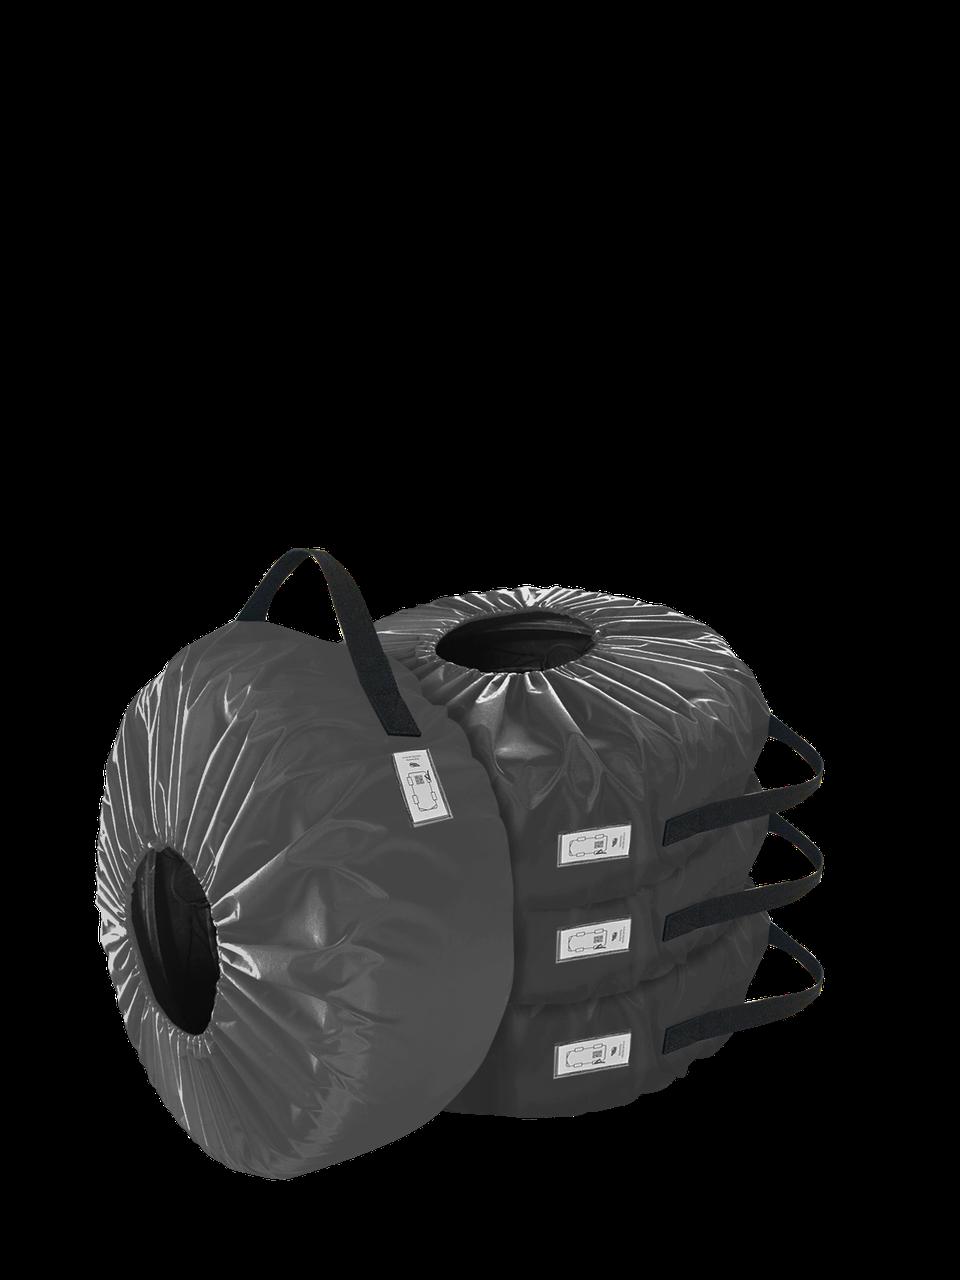 Комплект чехлов для колес Coverbag  Eco XXL серый 4шт.